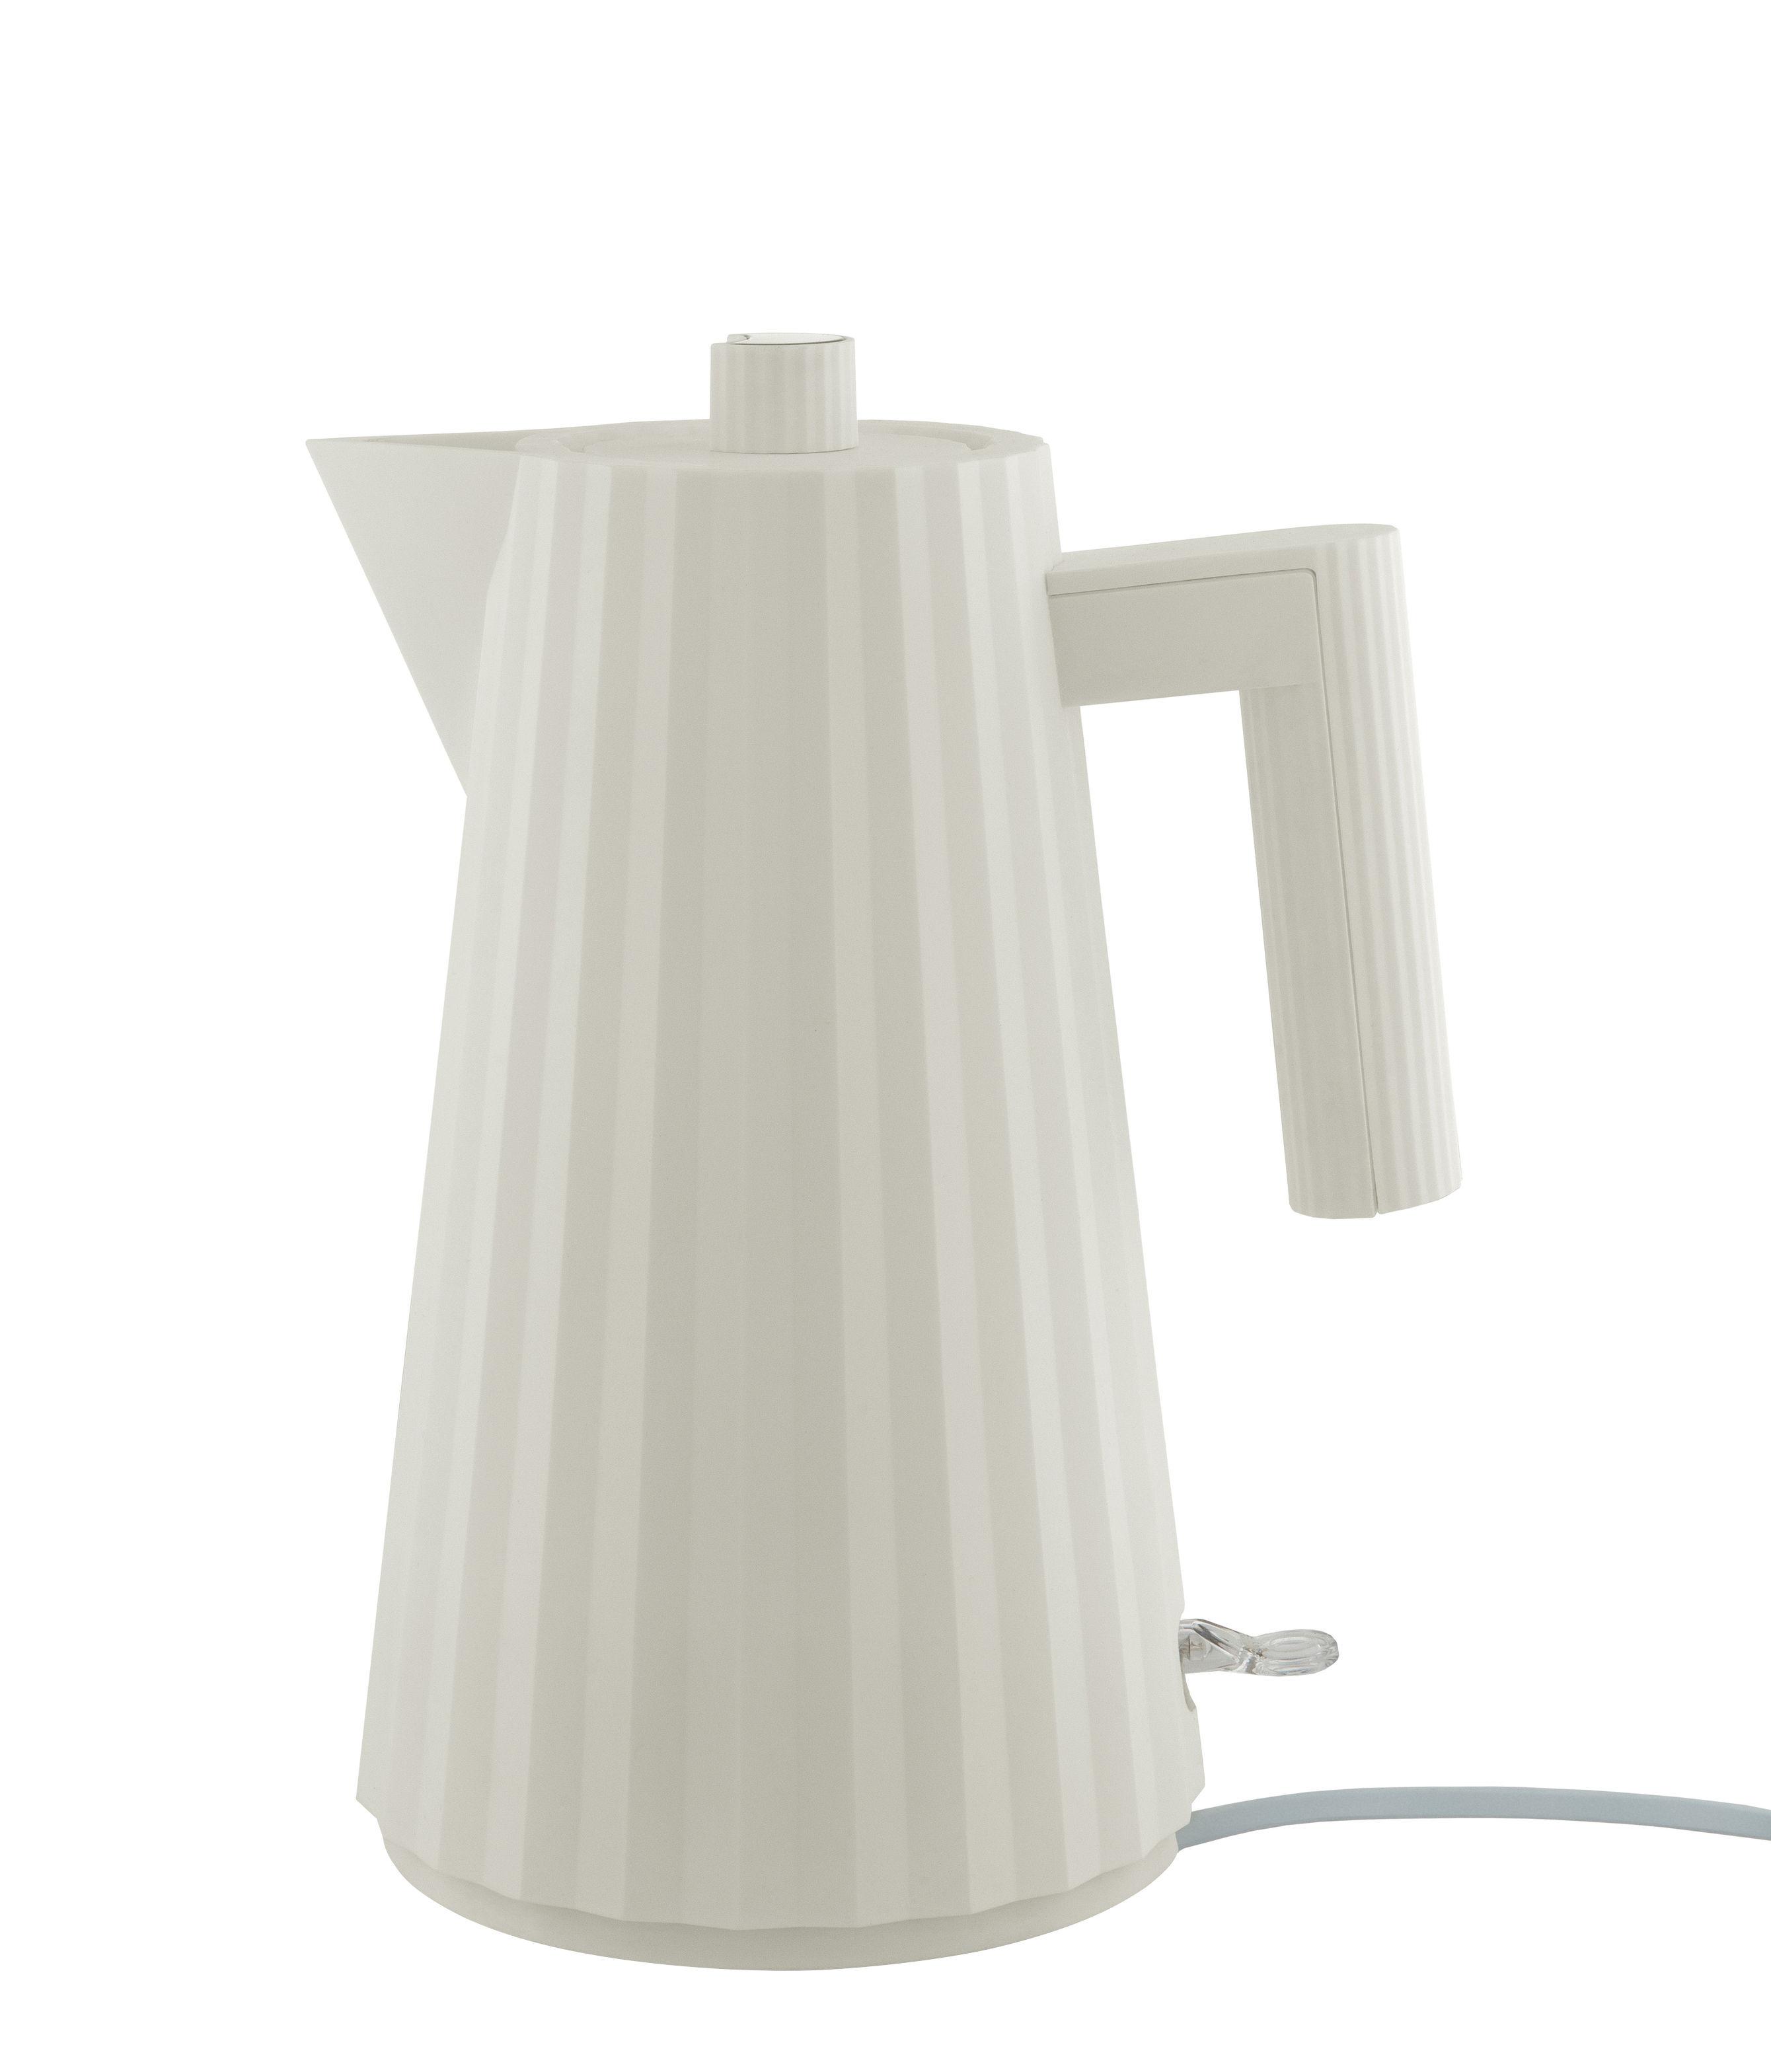 Cucina - Teiere e Bollitori - Bollitore elettrico Plissé - / 1,7 L di Alessi - Bianco - Resina termoplastica